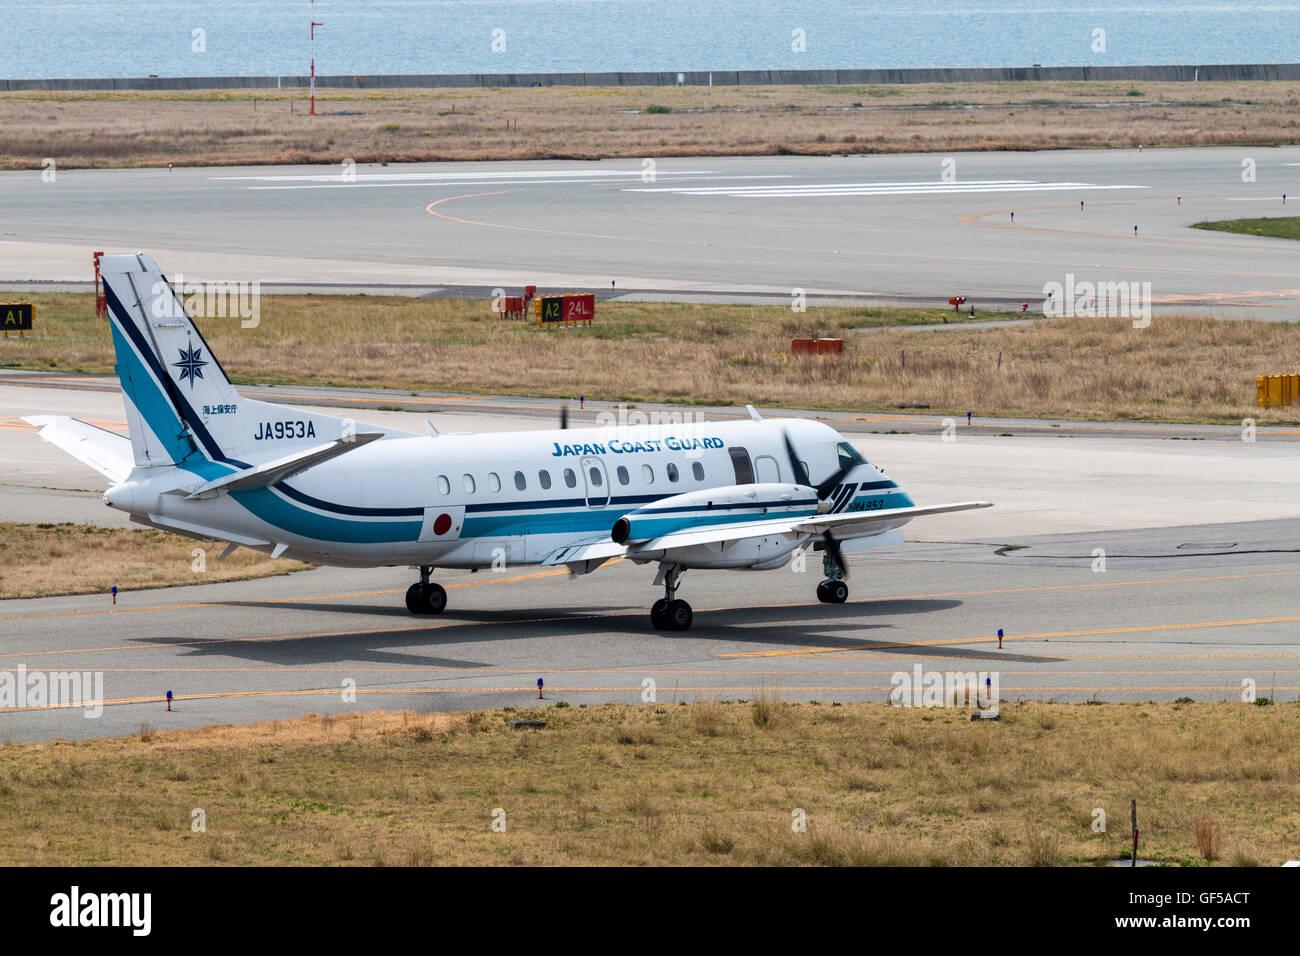 Japan, Osaka, Kansai airport, KIX. Japanese Coast Gaurd SAAB 340, JA953A, turboprop airplane with engines running - Stock Image